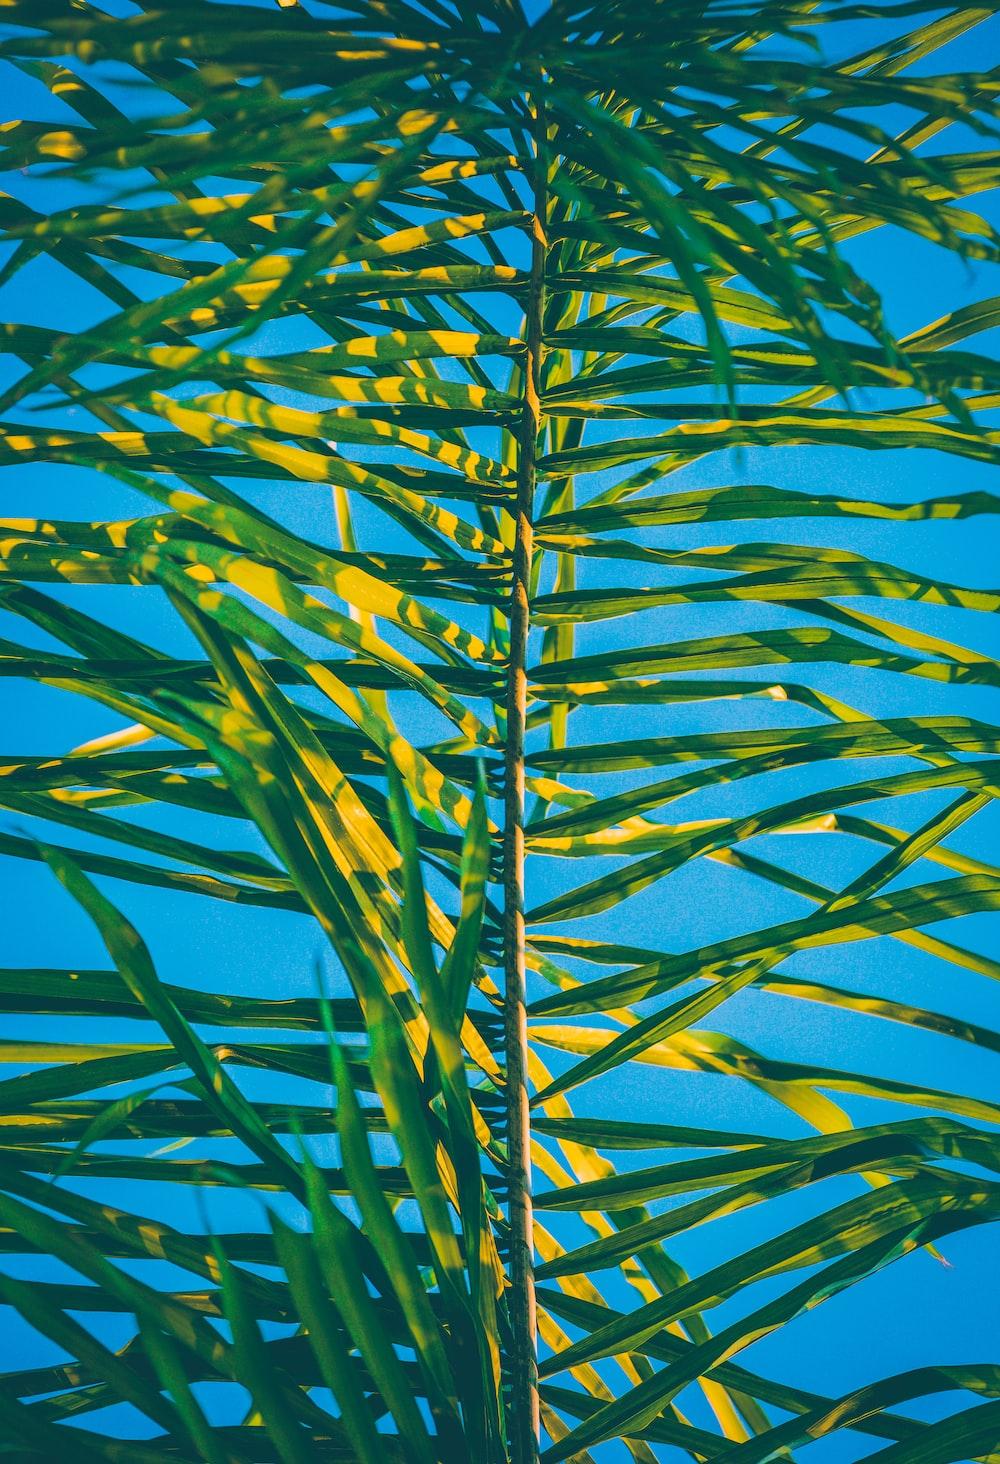 green palm tree leaf at daytime